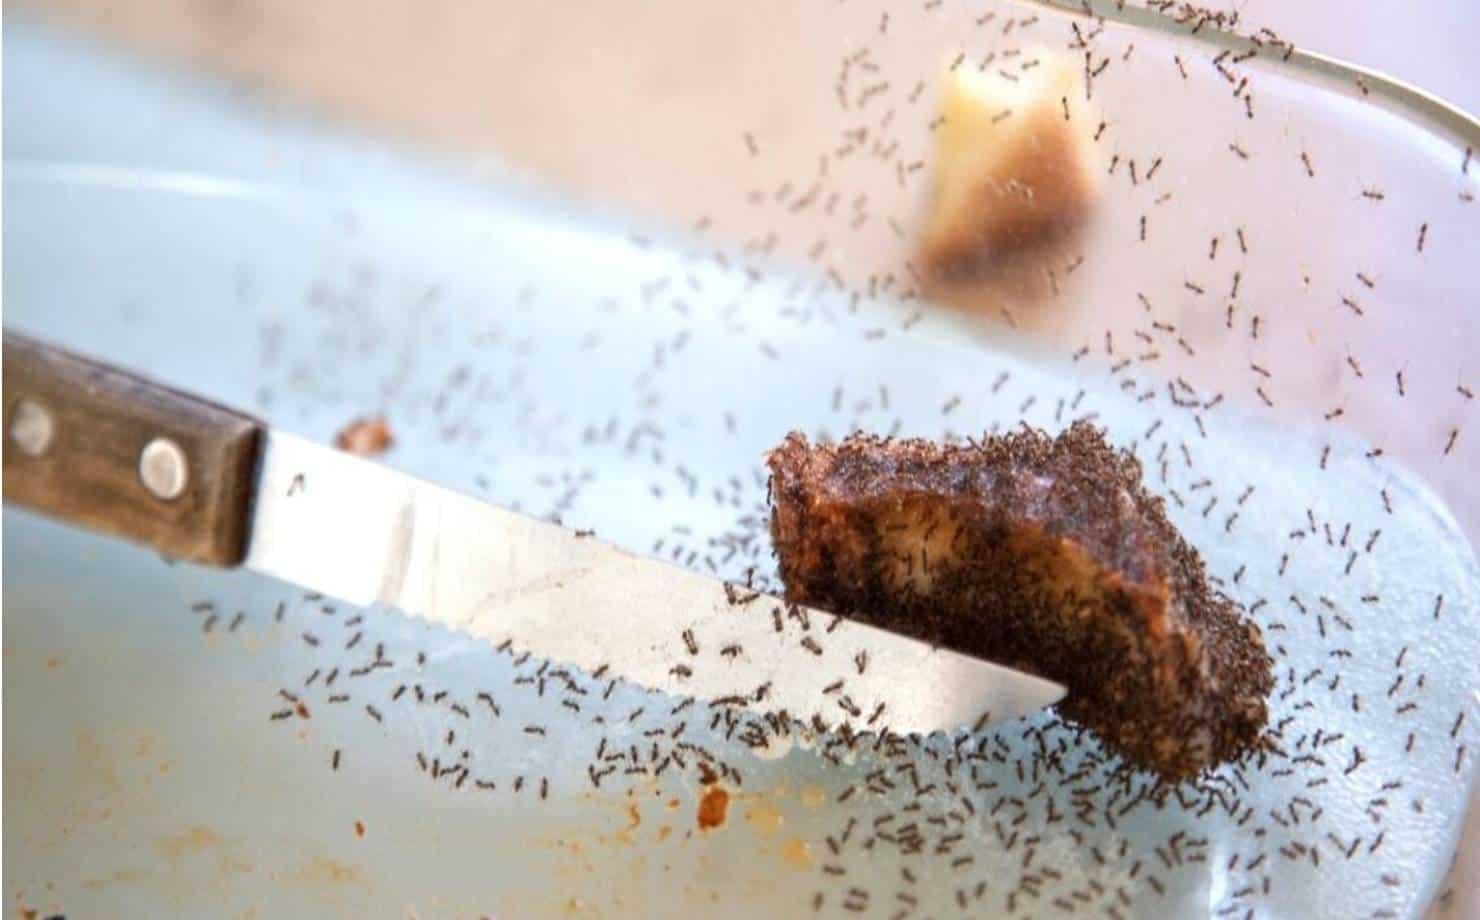 3 métodos naturais para remover formigas do lar